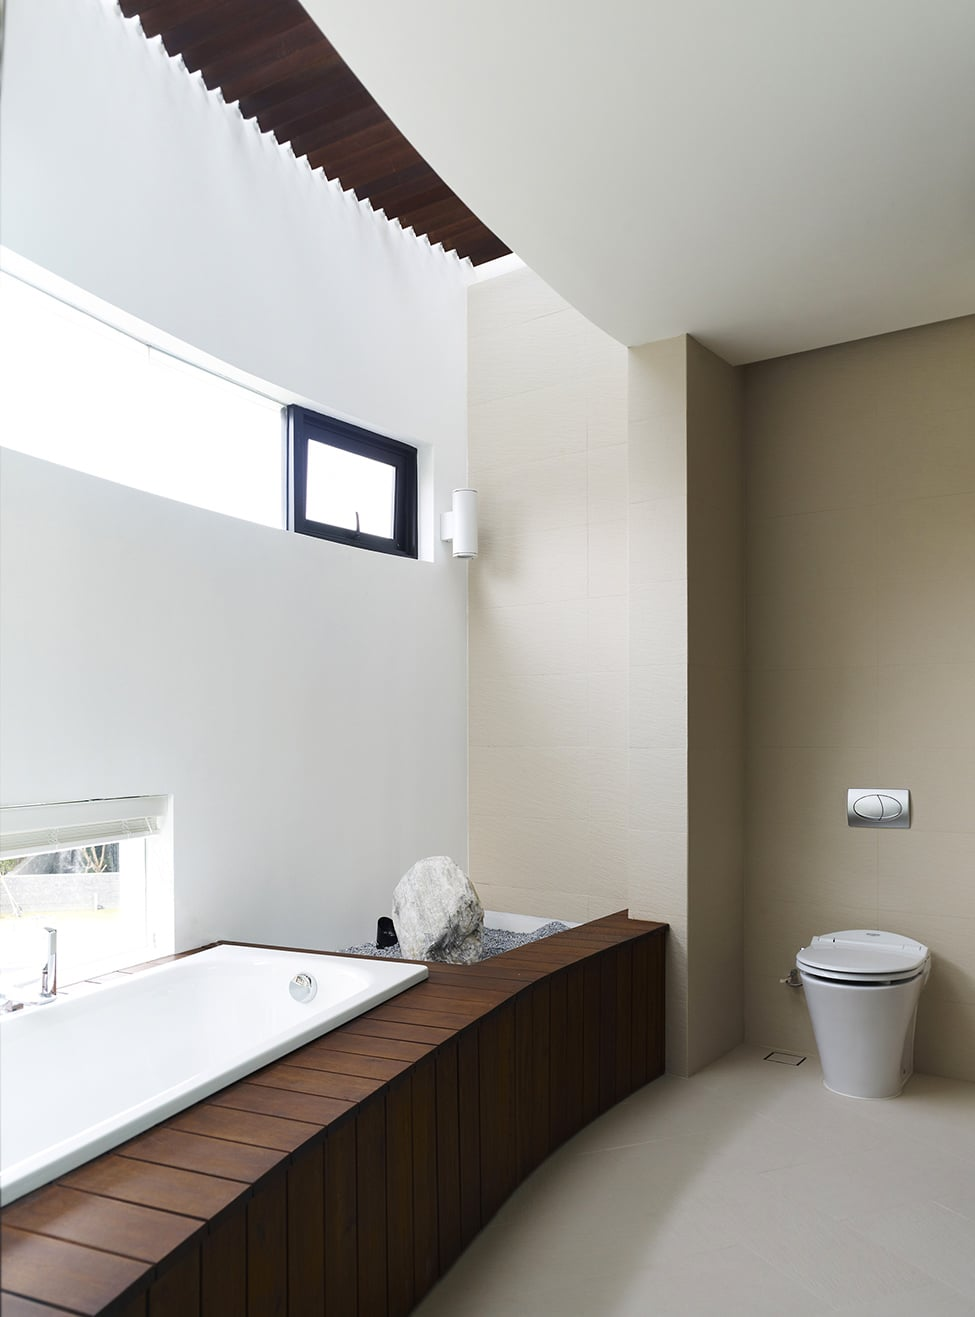 Diseno De Baños Con Tina:Monochromatic Interior Design Space